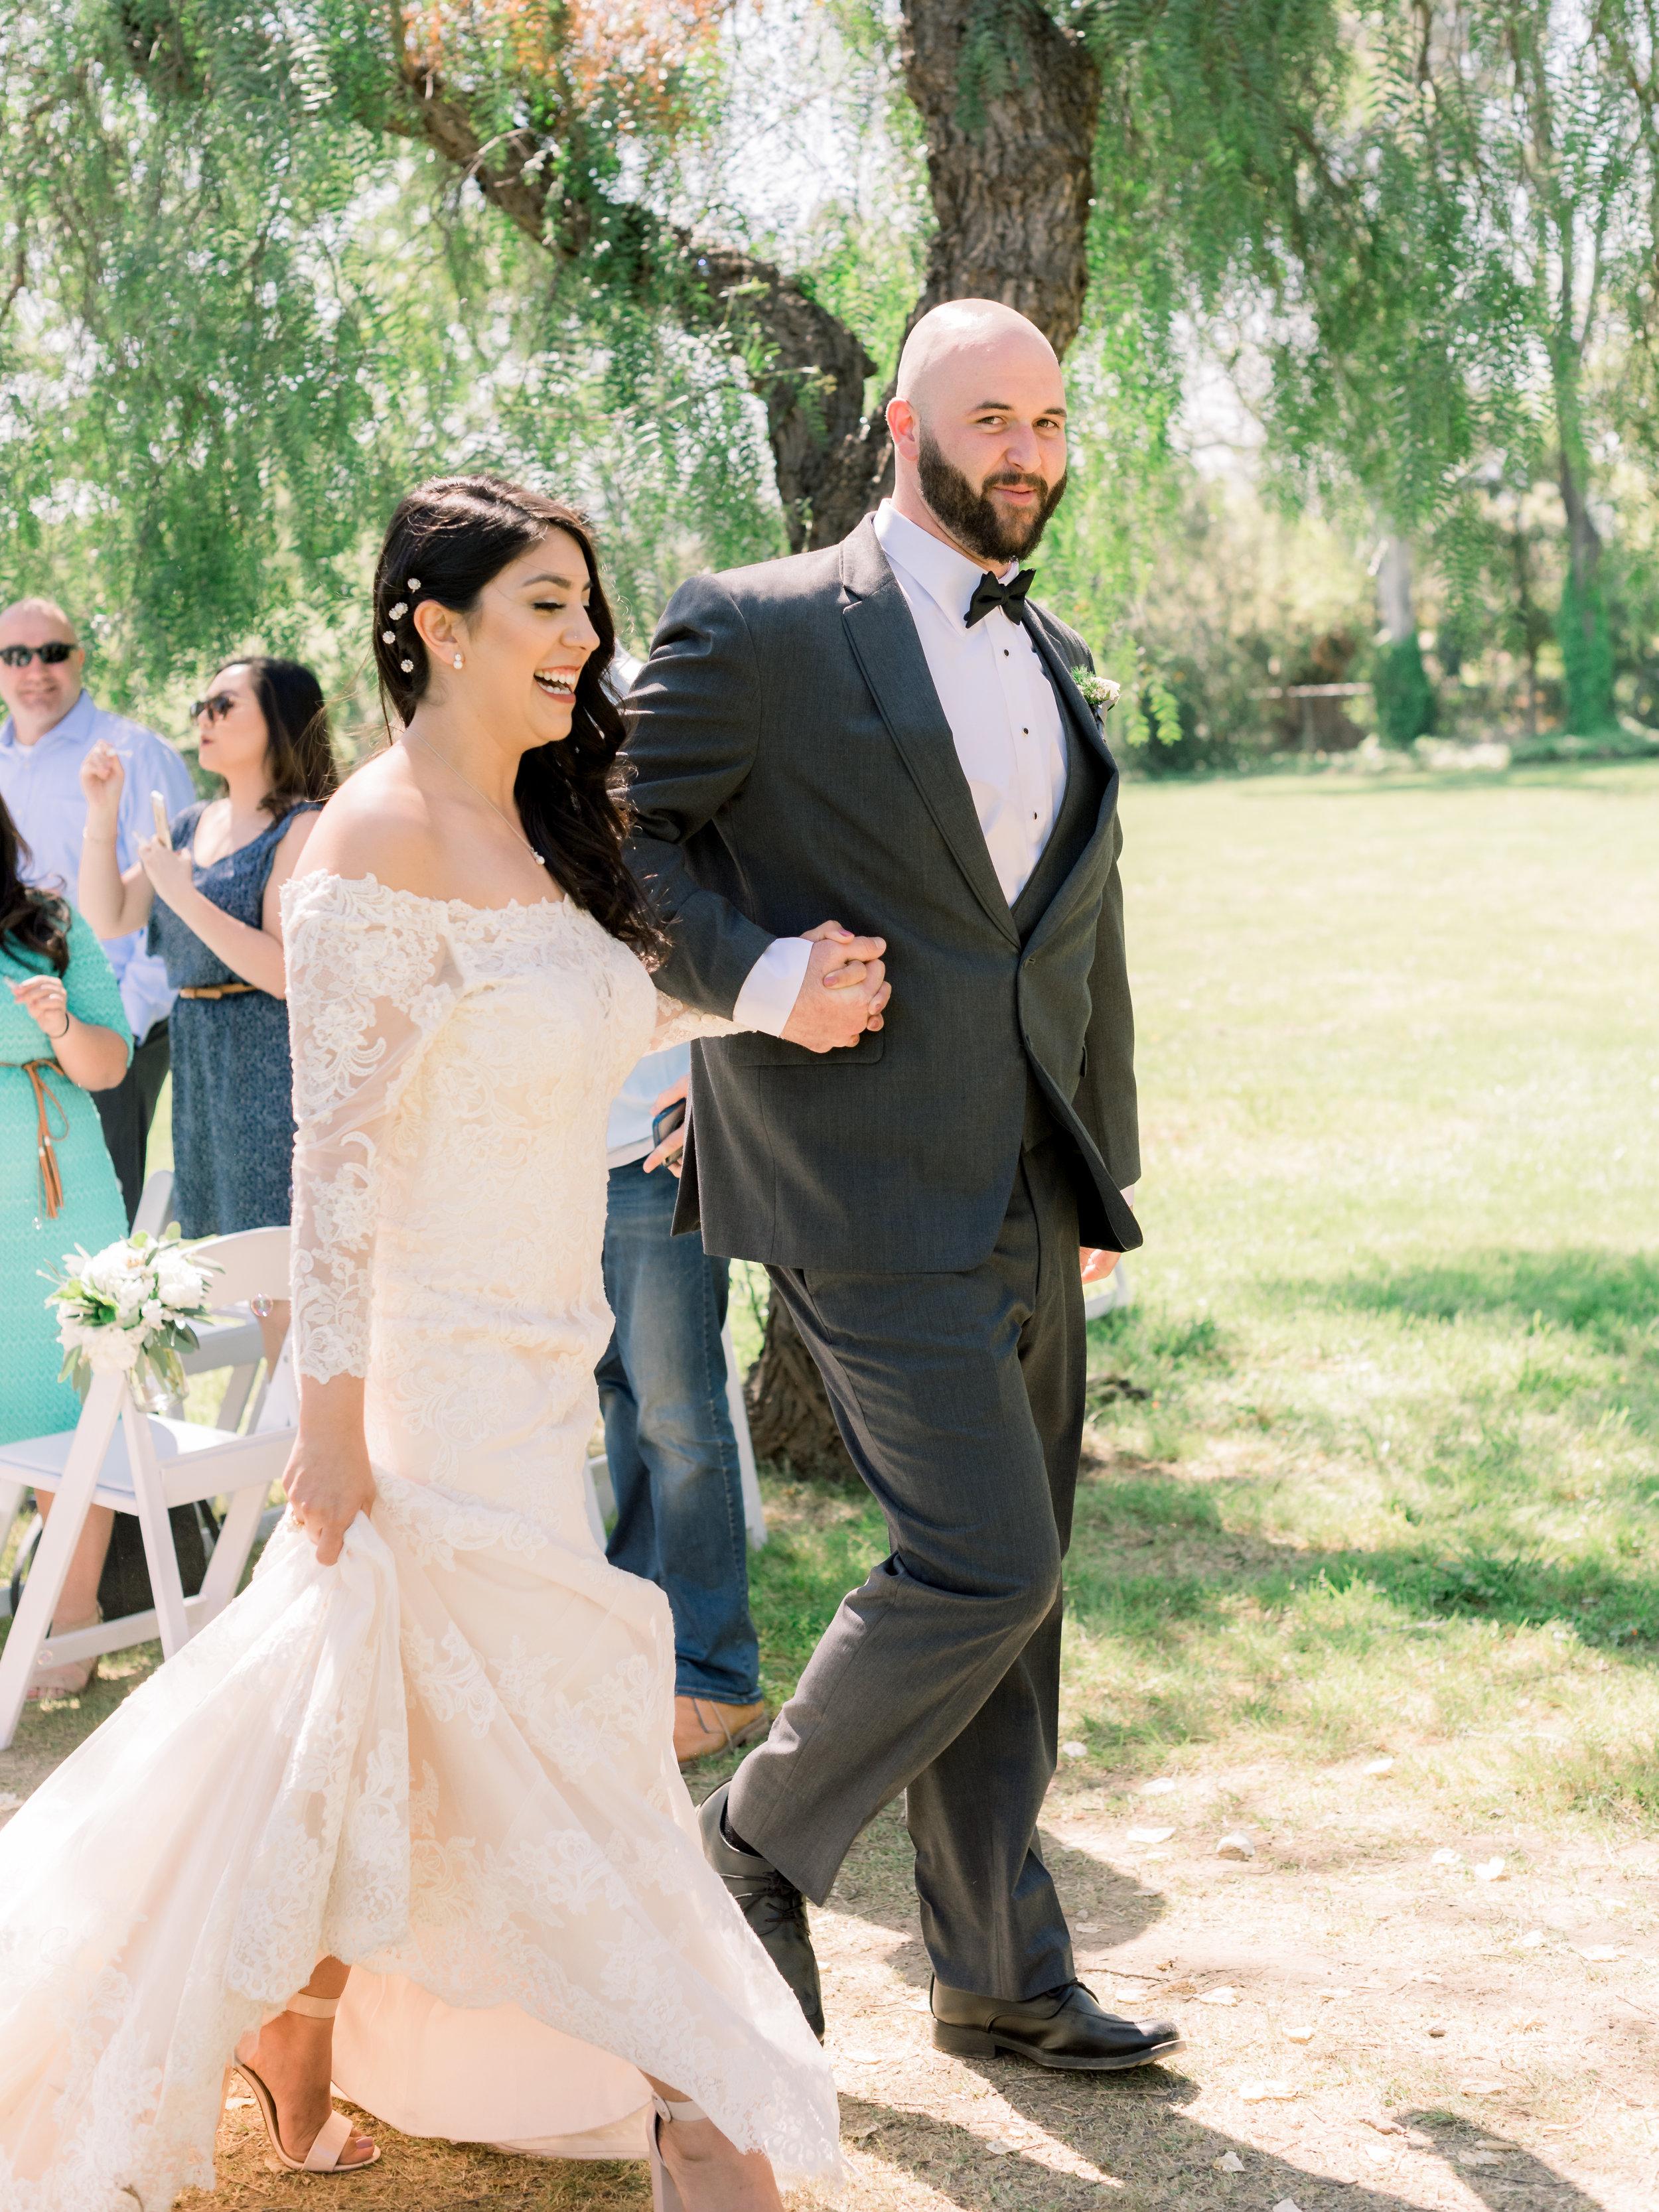 bride-and-groom-walk-back-down-the-aisle-just-married.jpg